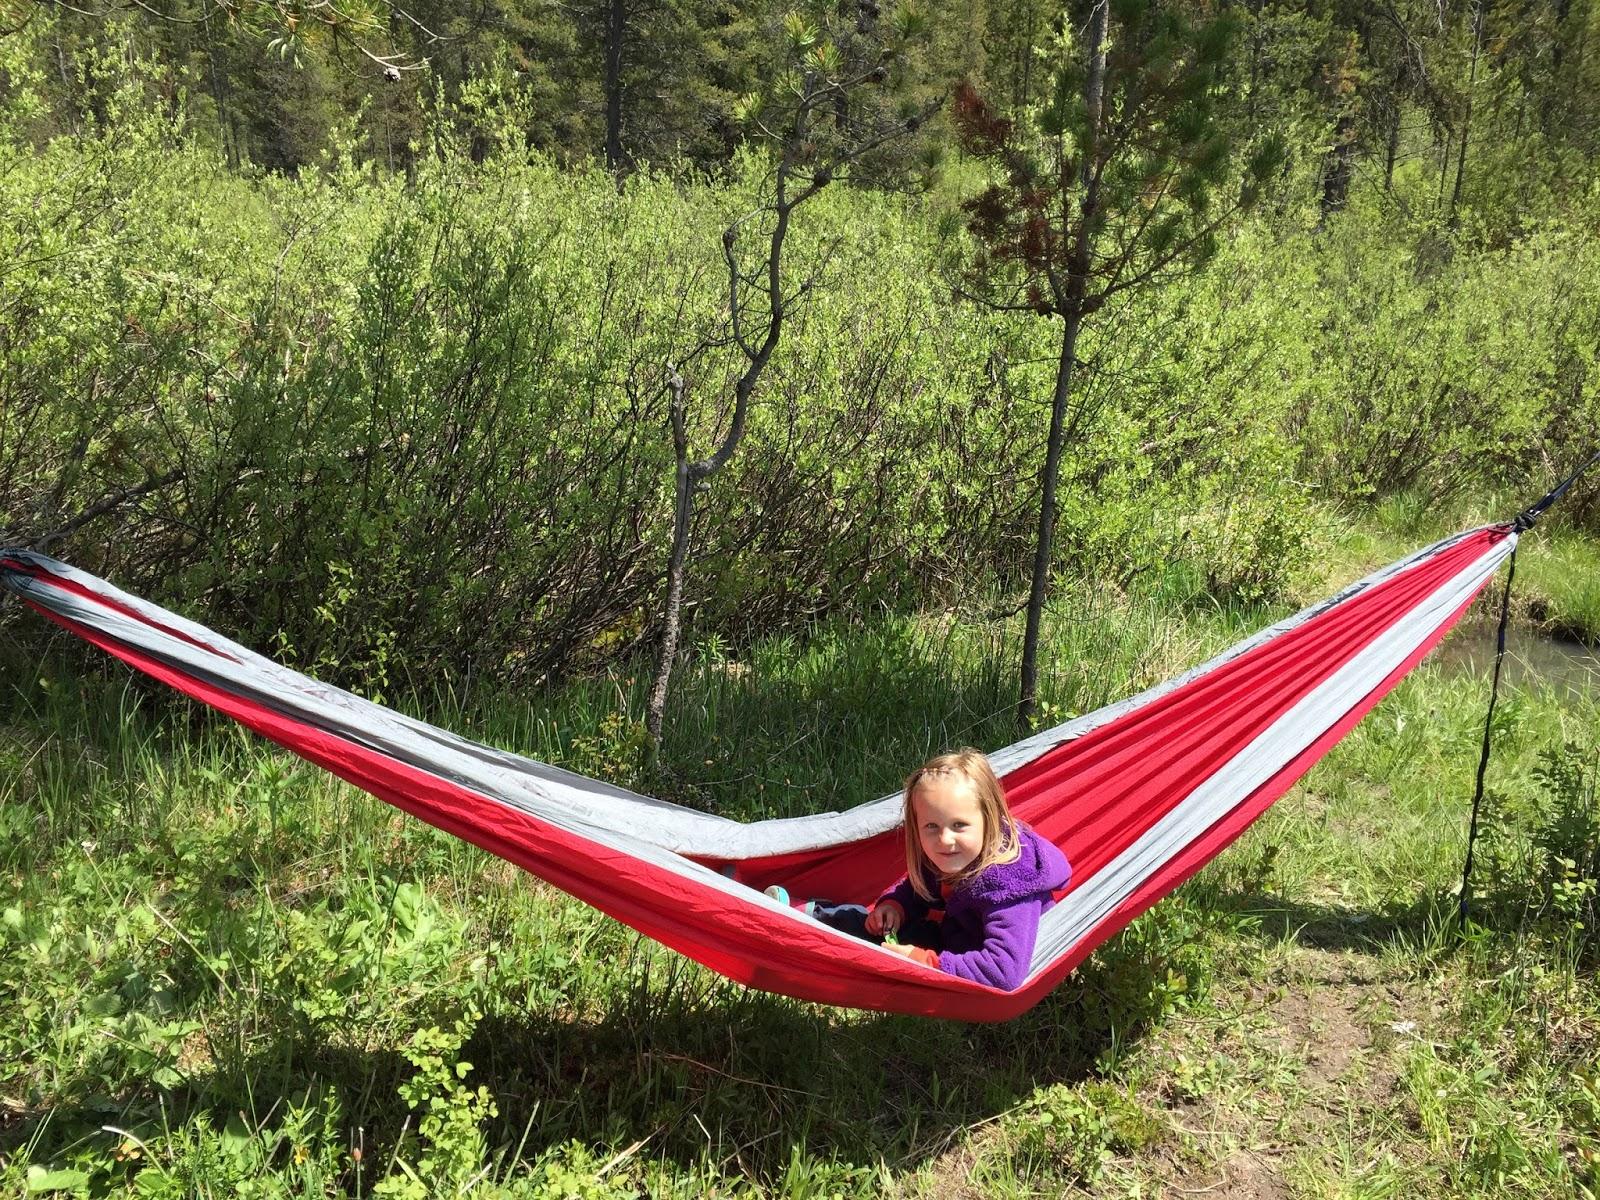 wb hammock from rope hms oc cotton island pawley